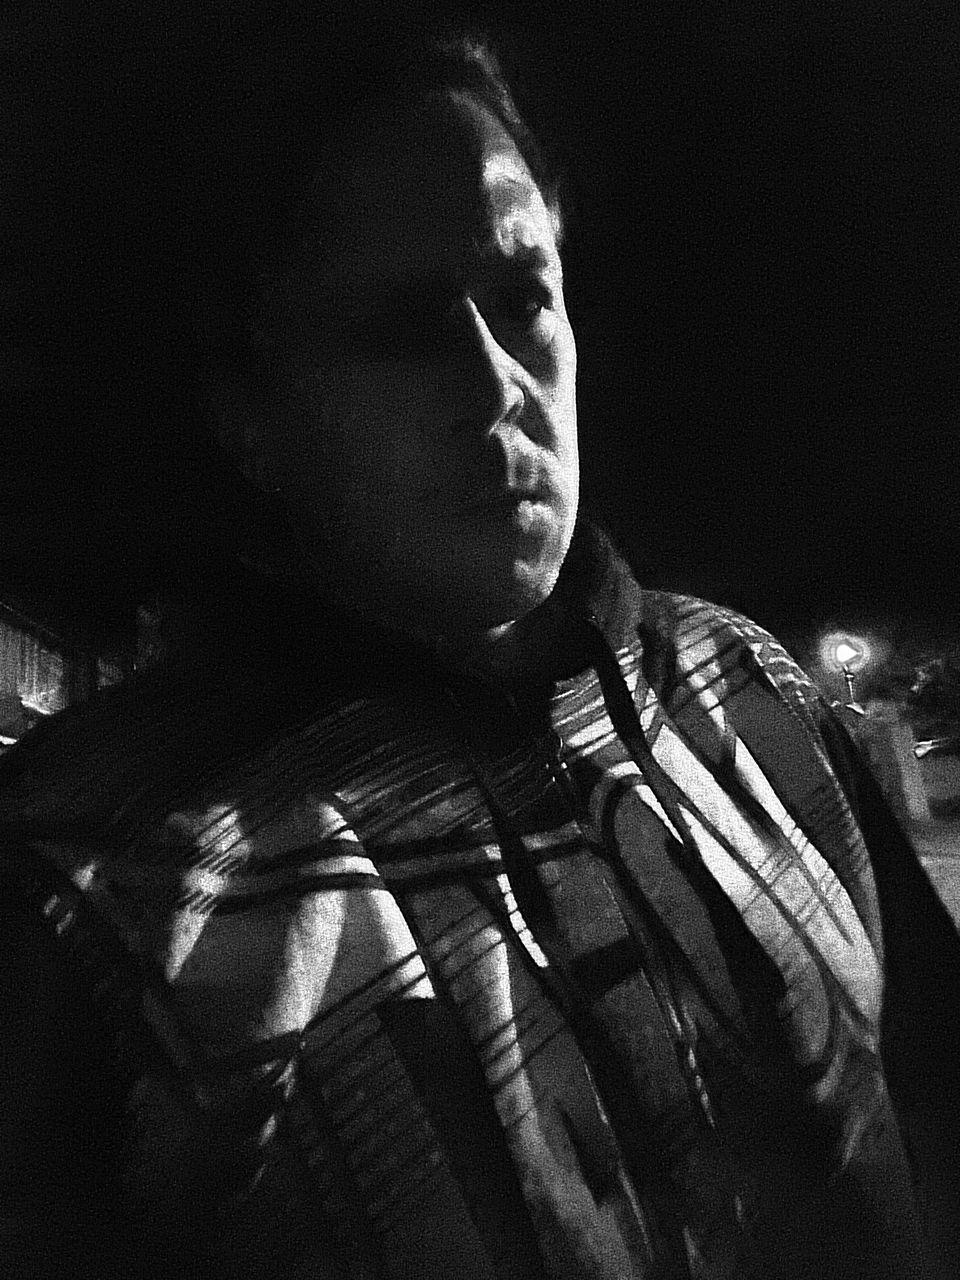 Portrait Of Man At Night